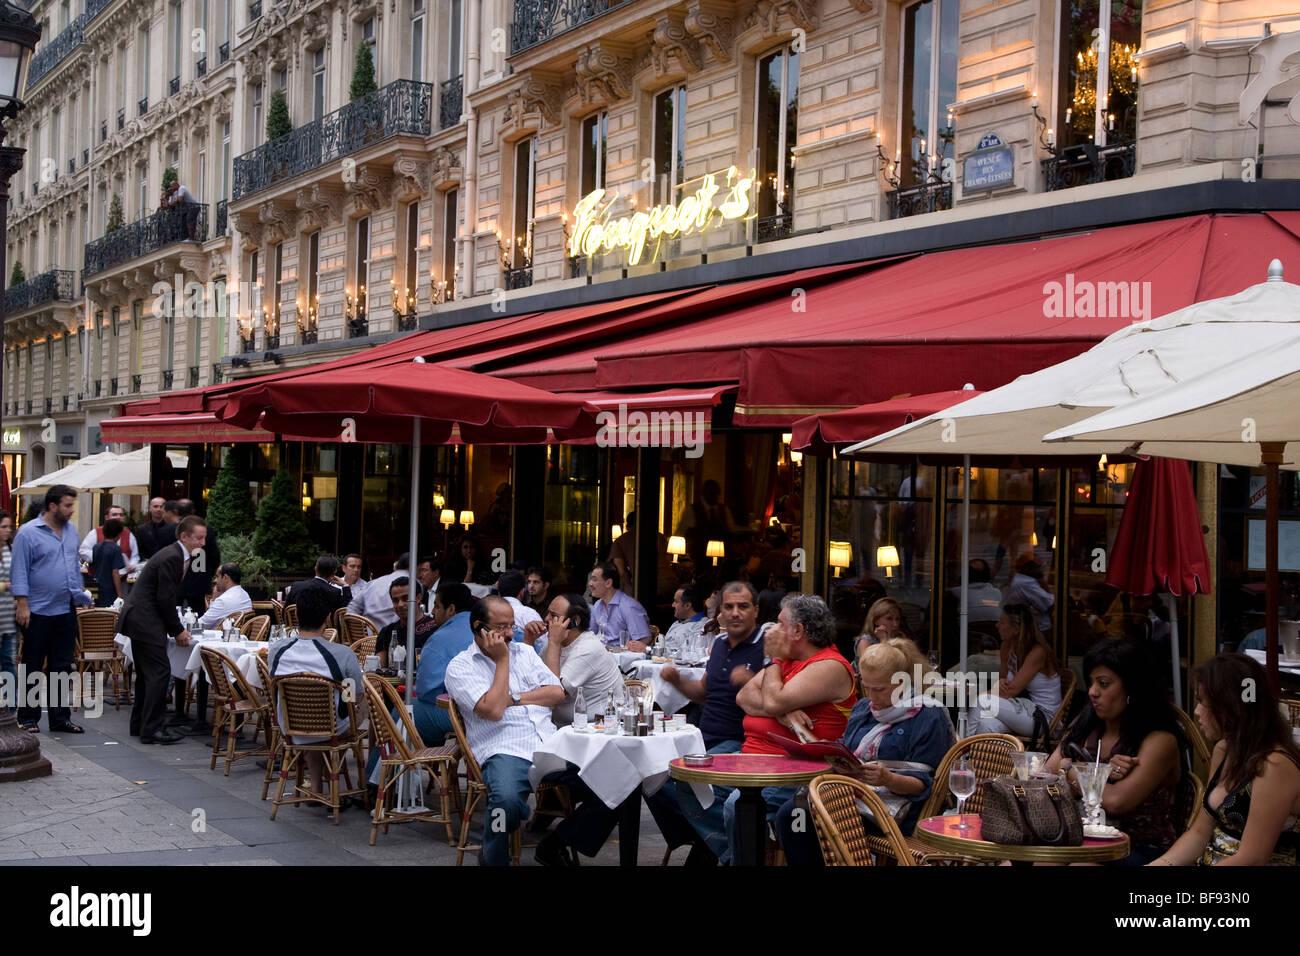 fouquets restaurant champs elysees paris france stock photo royalty free image 26630716 alamy. Black Bedroom Furniture Sets. Home Design Ideas